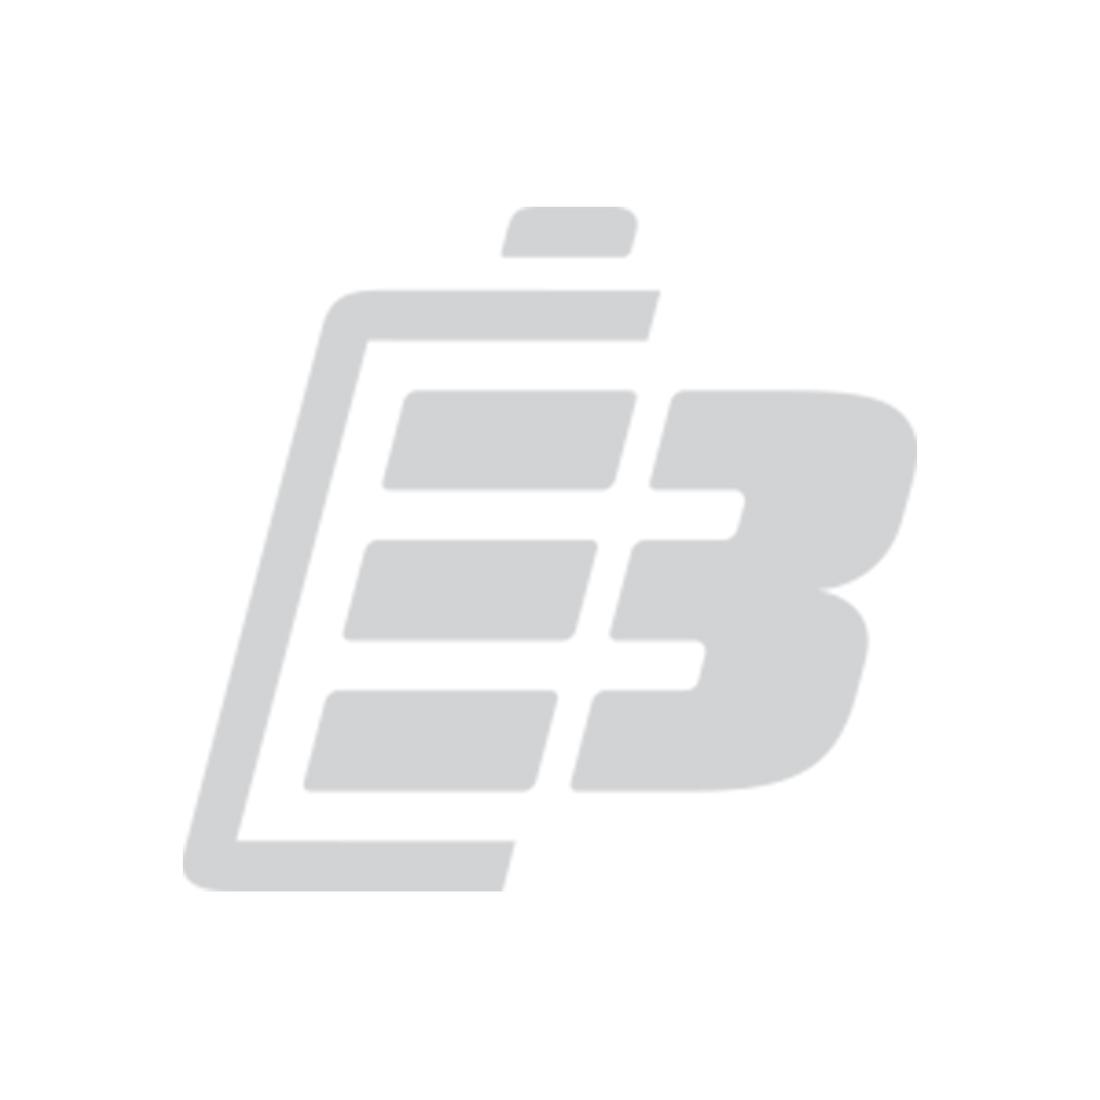 Camera battery charger Nikon EN-EL7_1